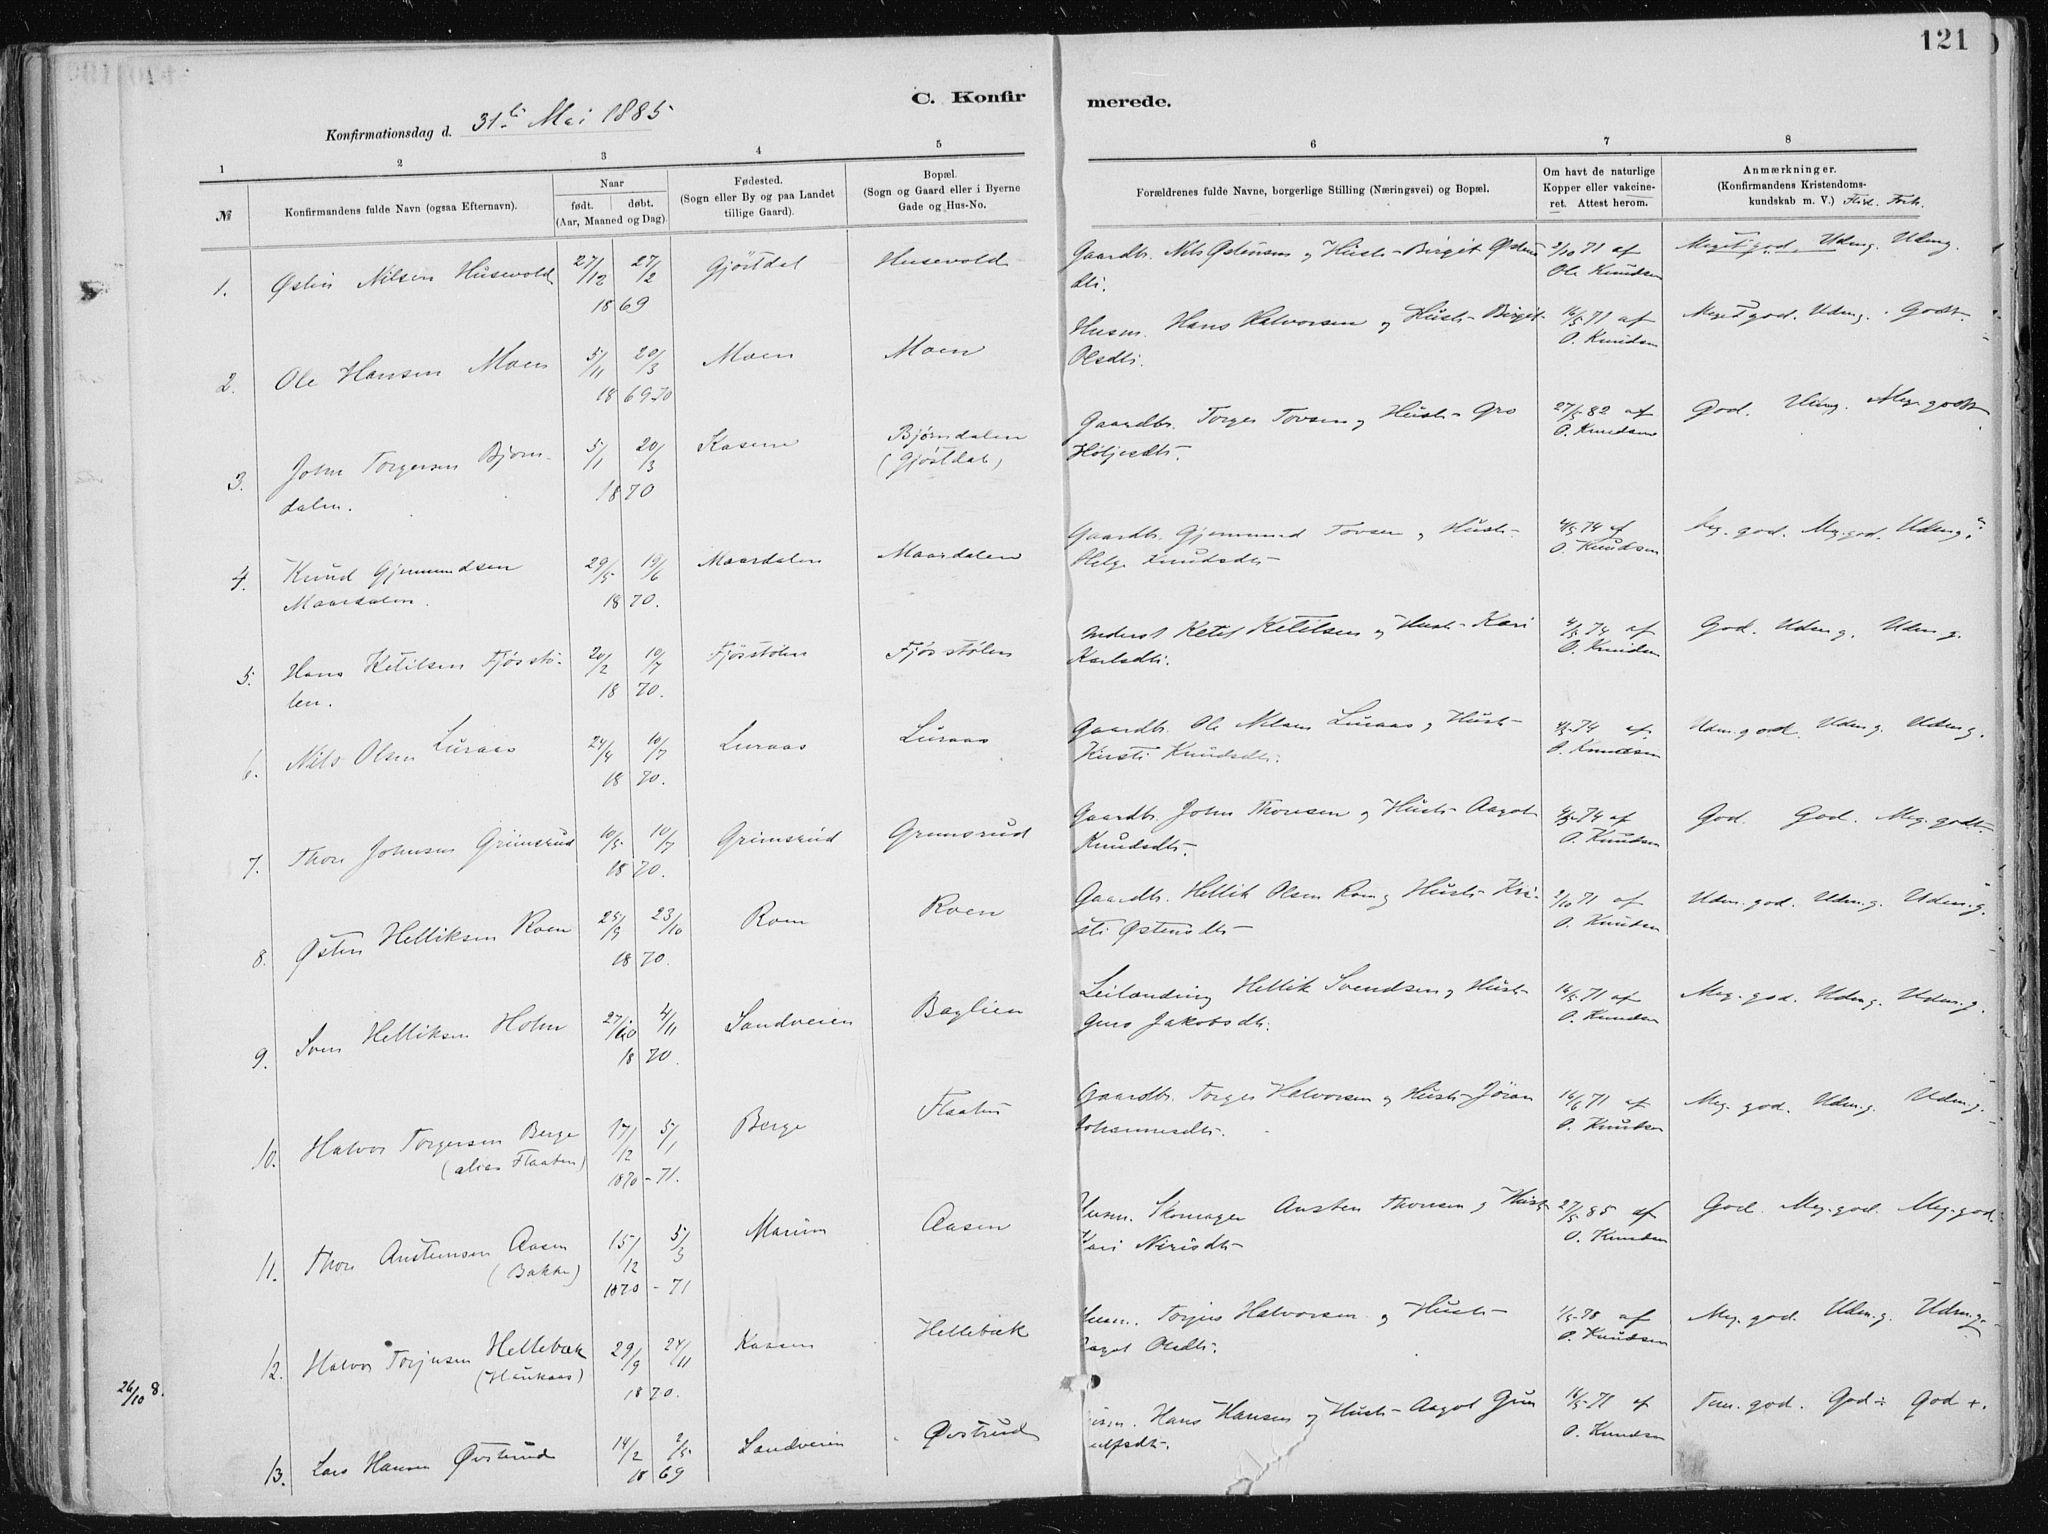 SAKO, Tinn kirkebøker, F/Fa/L0007: Ministerialbok nr. I 7, 1878-1922, s. 121